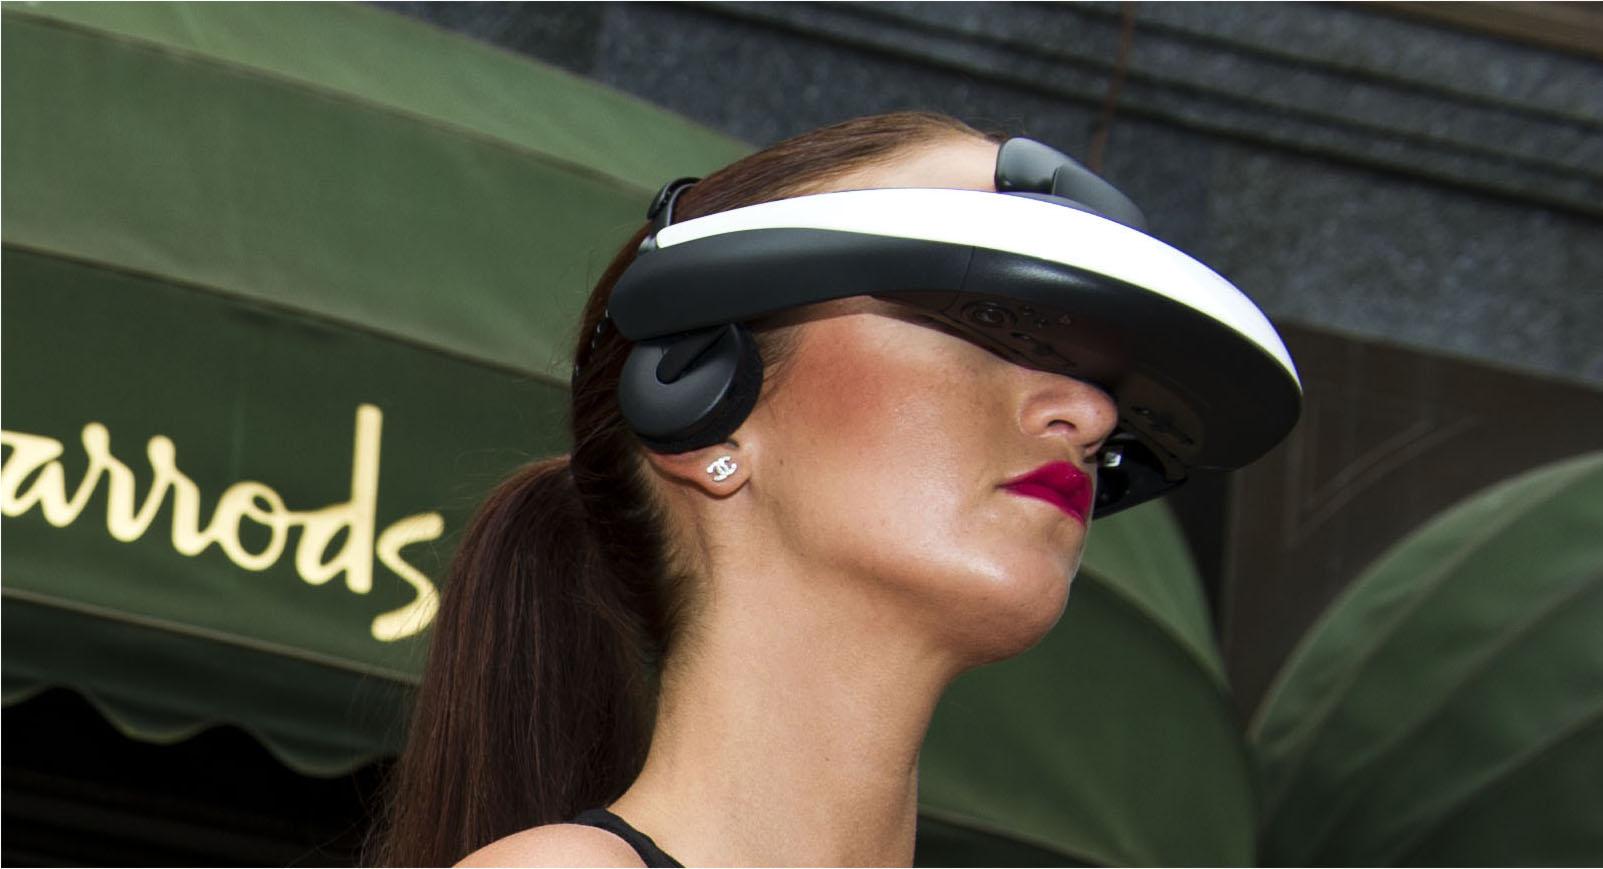 Sony Head Mounted Display